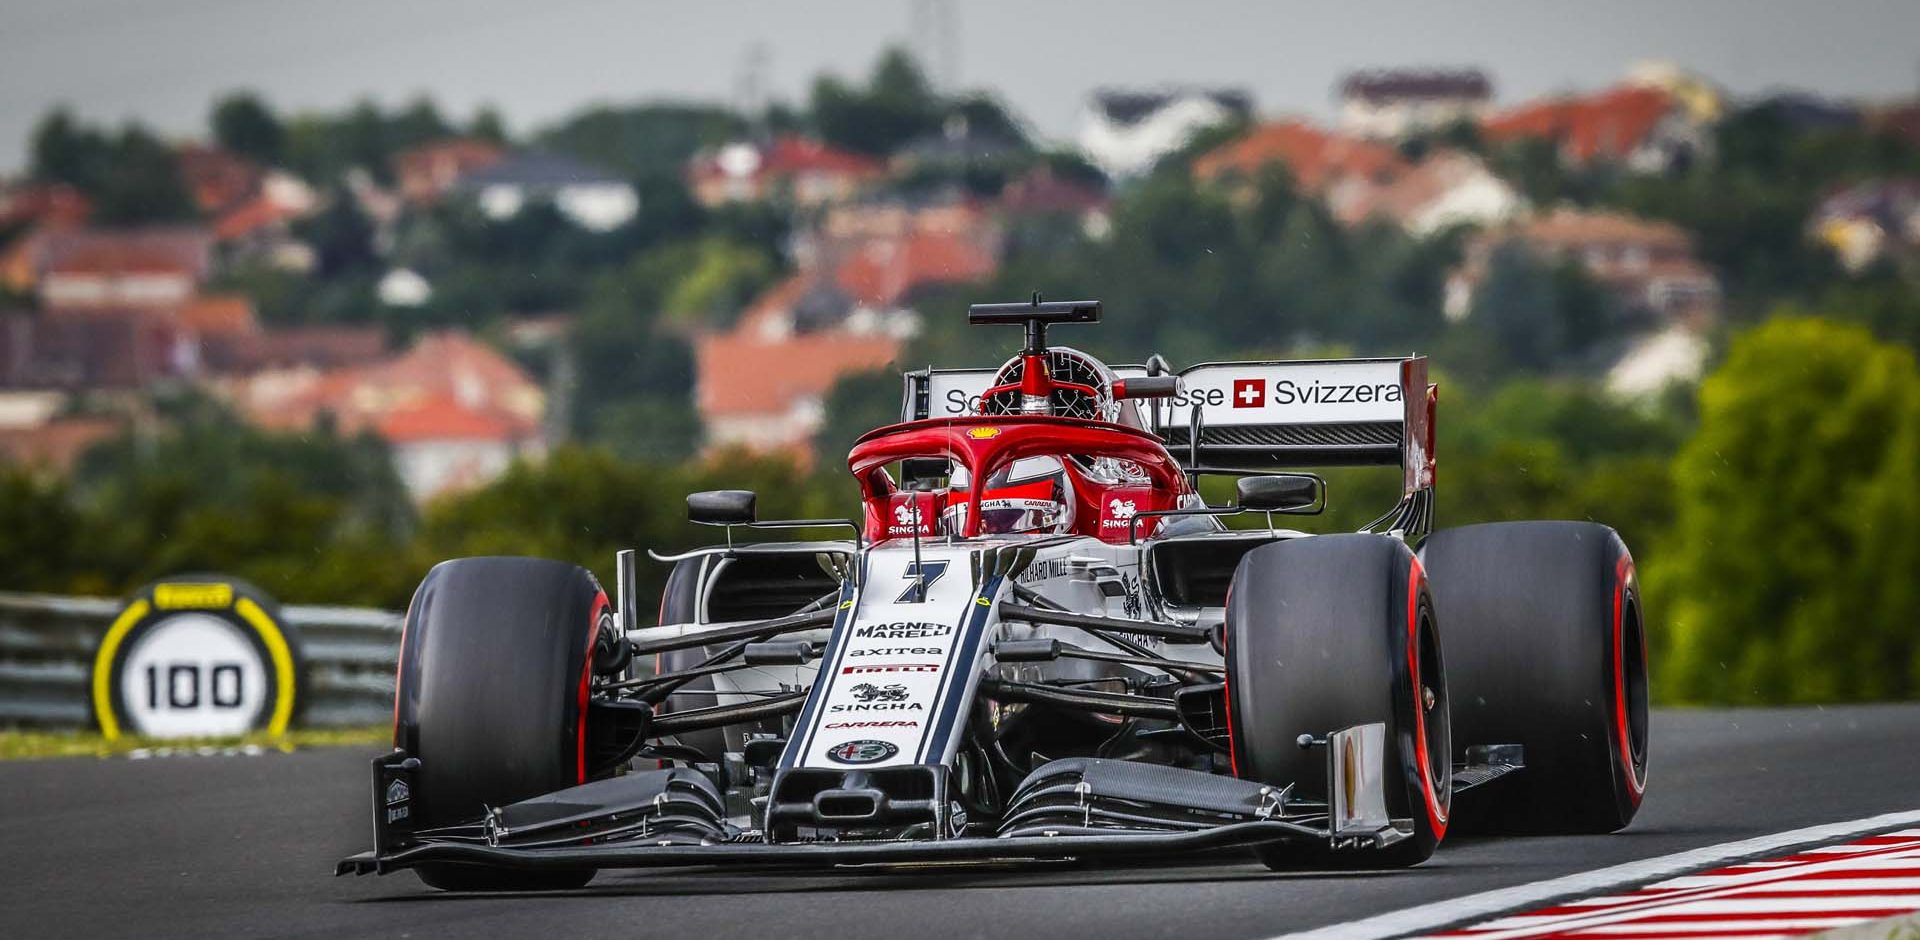 07 RAIKKONEN Kimi Räikkönen (fin), Alfa Romeo Racing C38, action during the 2019 Formula One World Championship, Grand Prix of Hungary from august 1 to 4, Hungaroring, Budapest - Photo Florent Gooden / DPPI